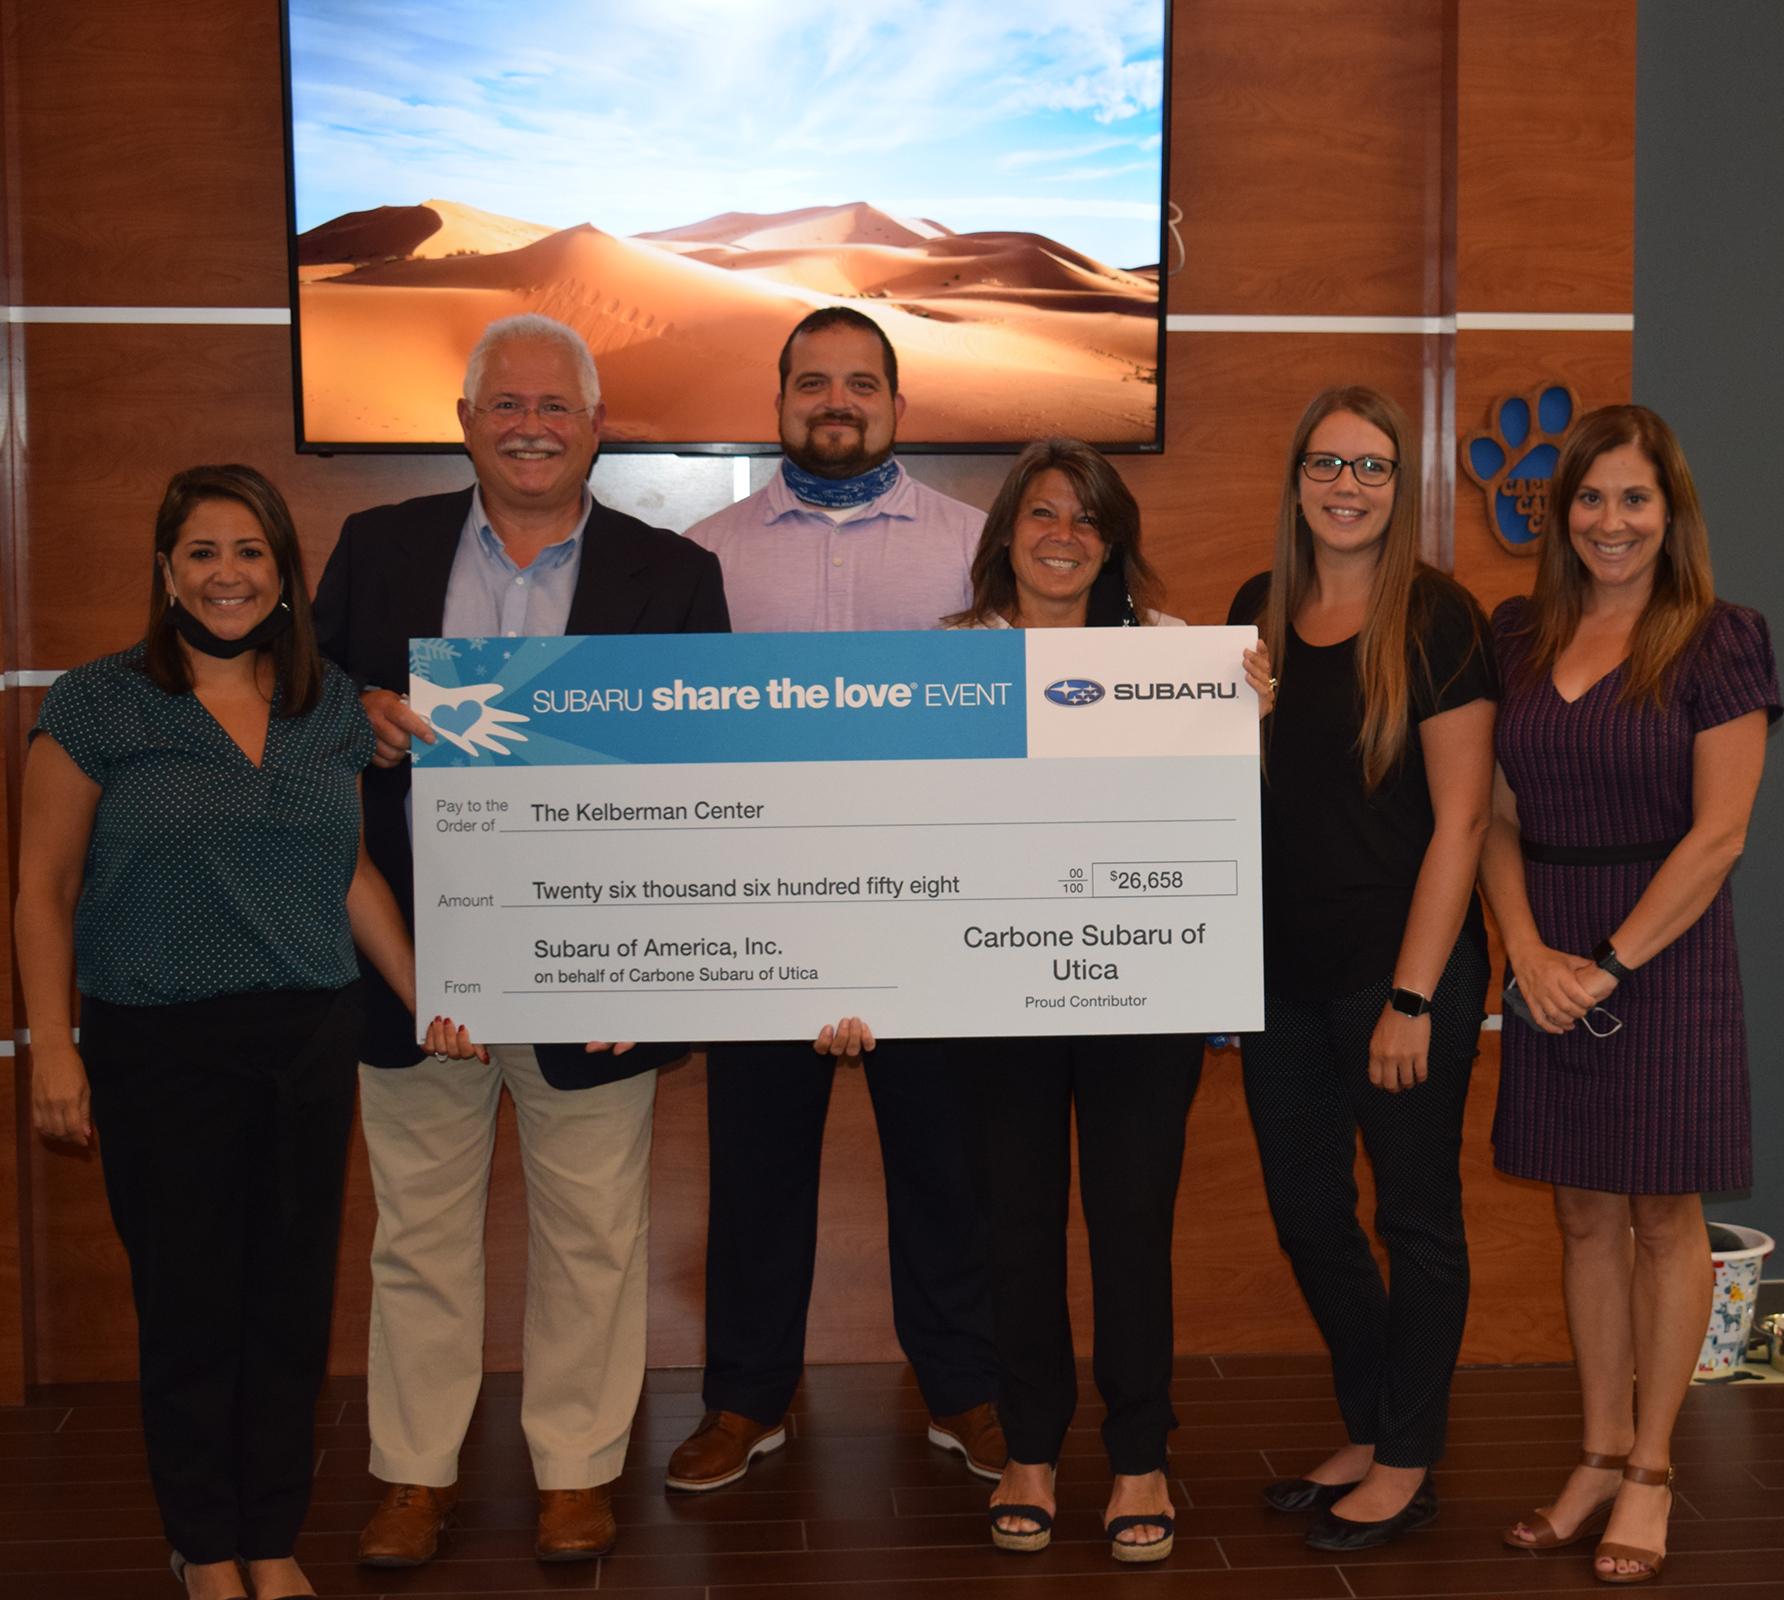 Subaru and Carbone Auto Group Donate to the Kelberman Center